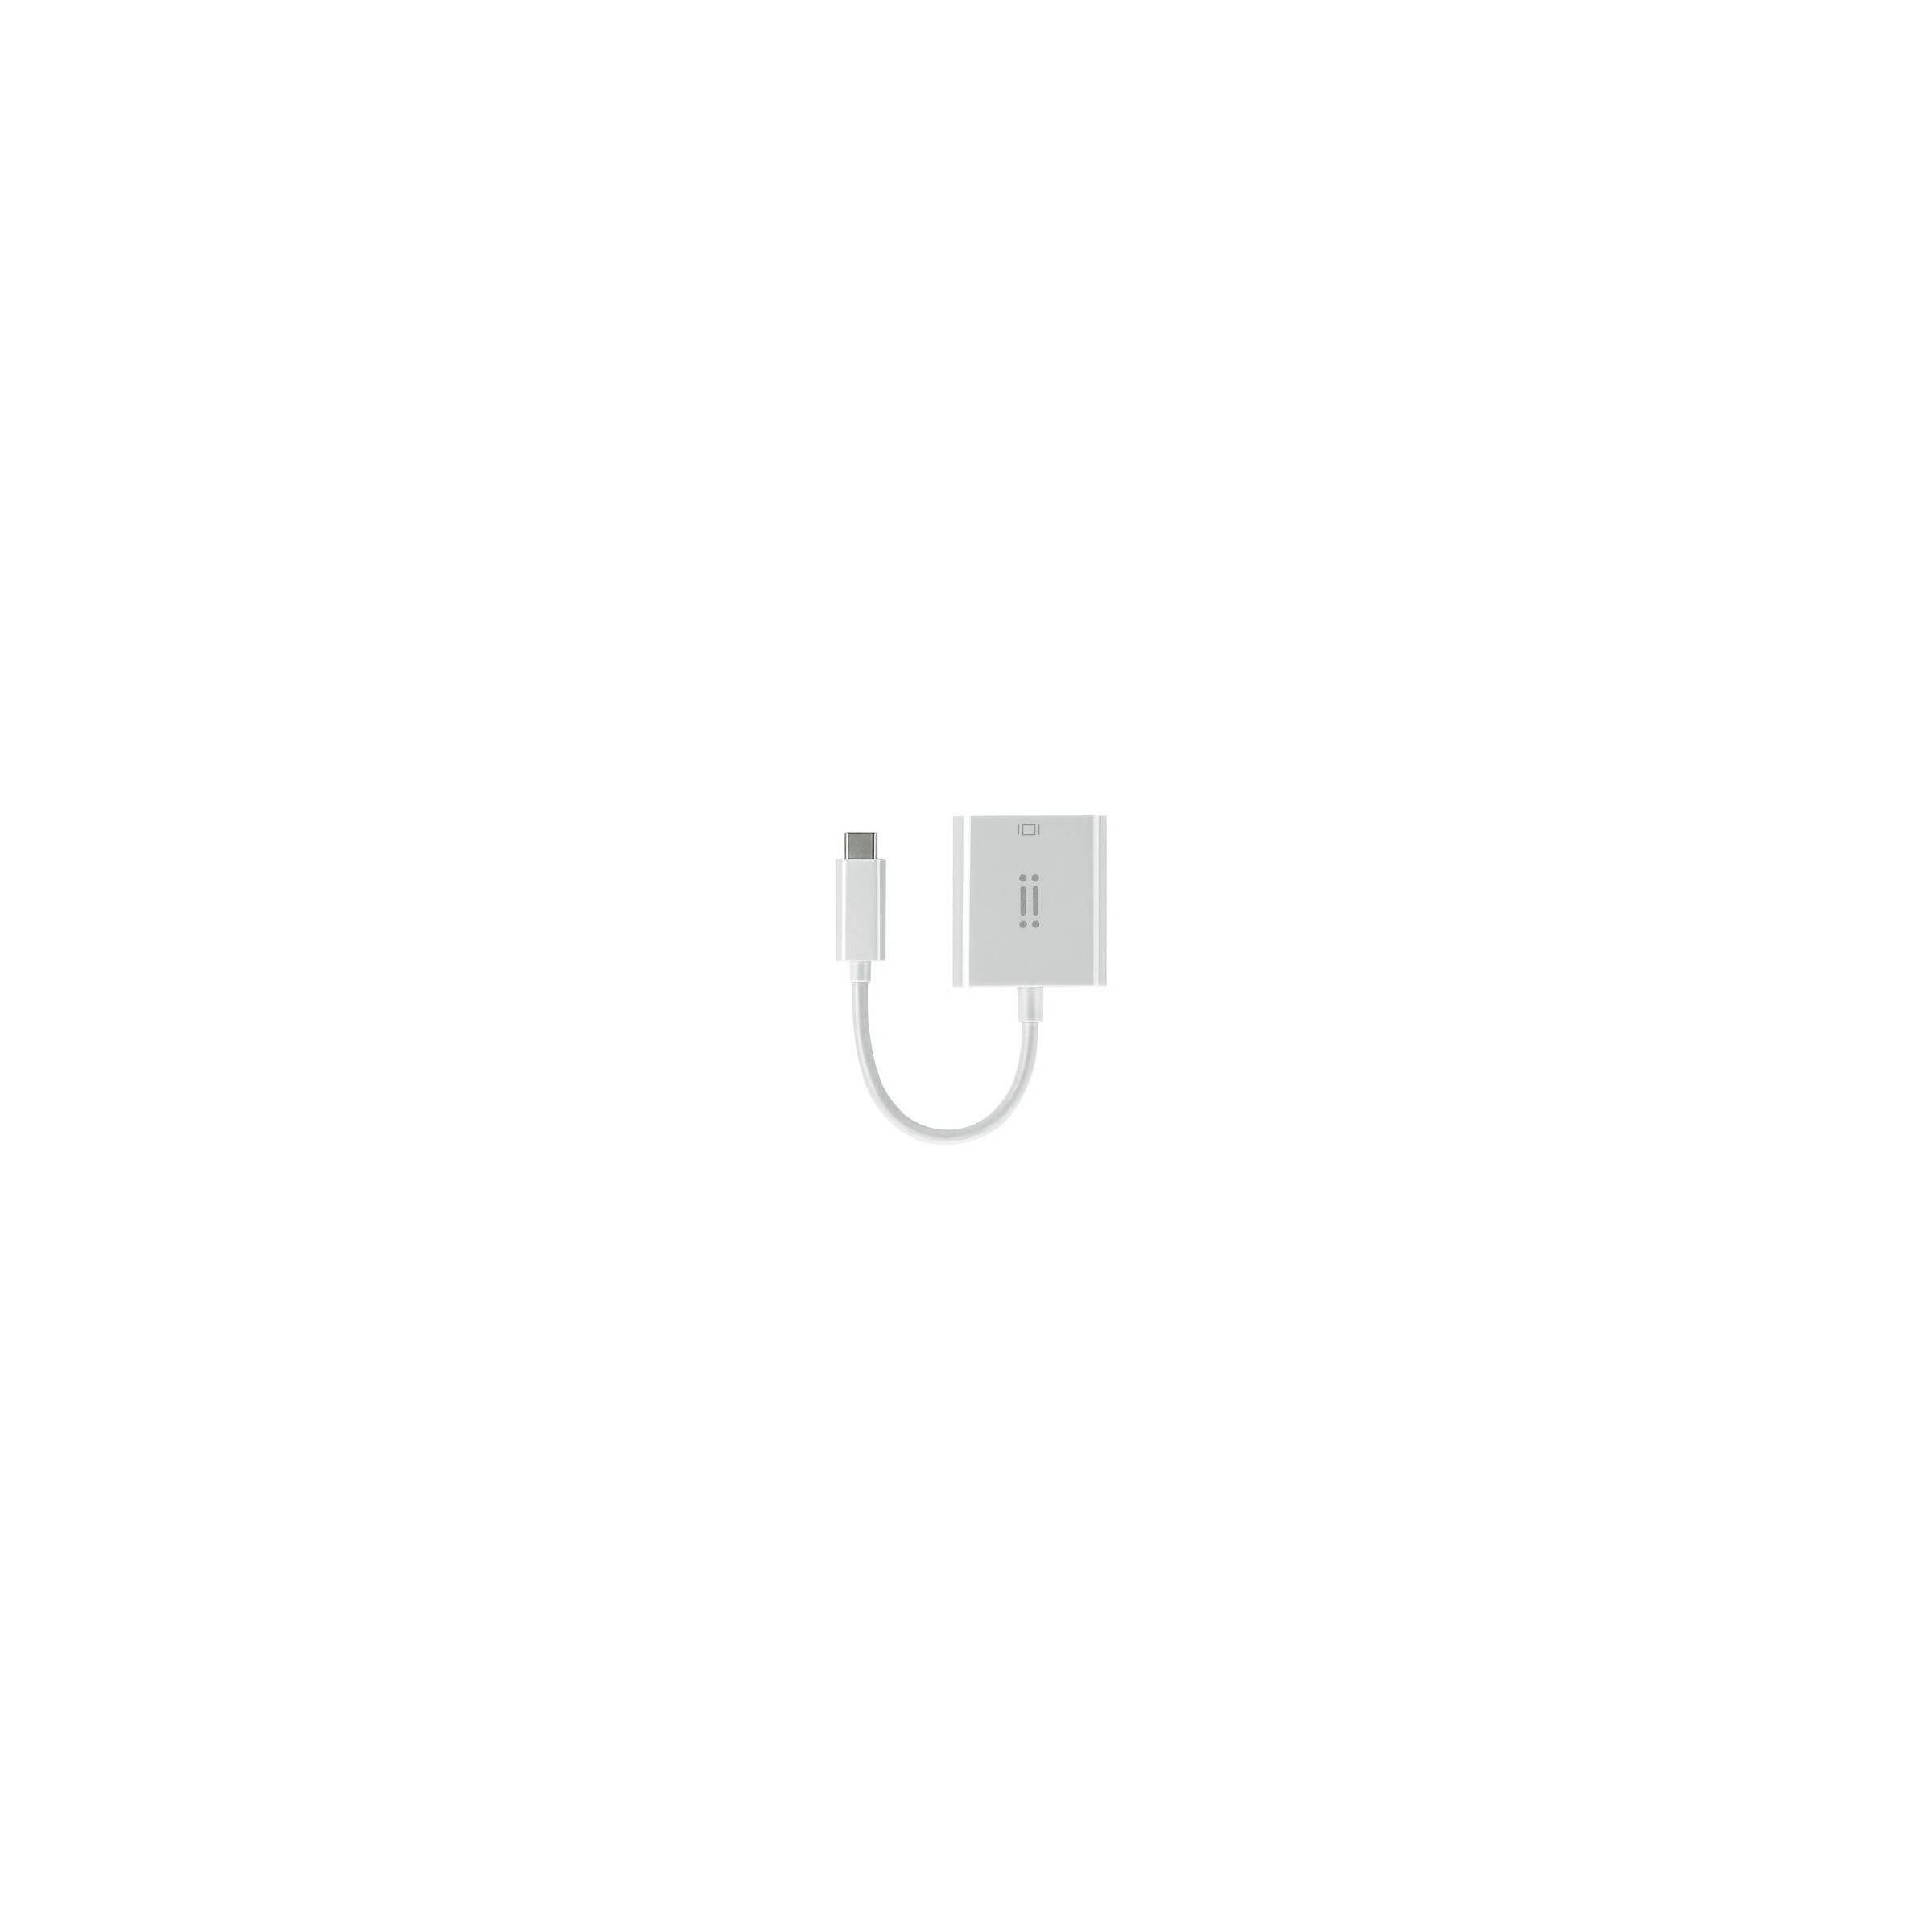 aiino – Aiino usb-c til vga adapter på mackabler.dk